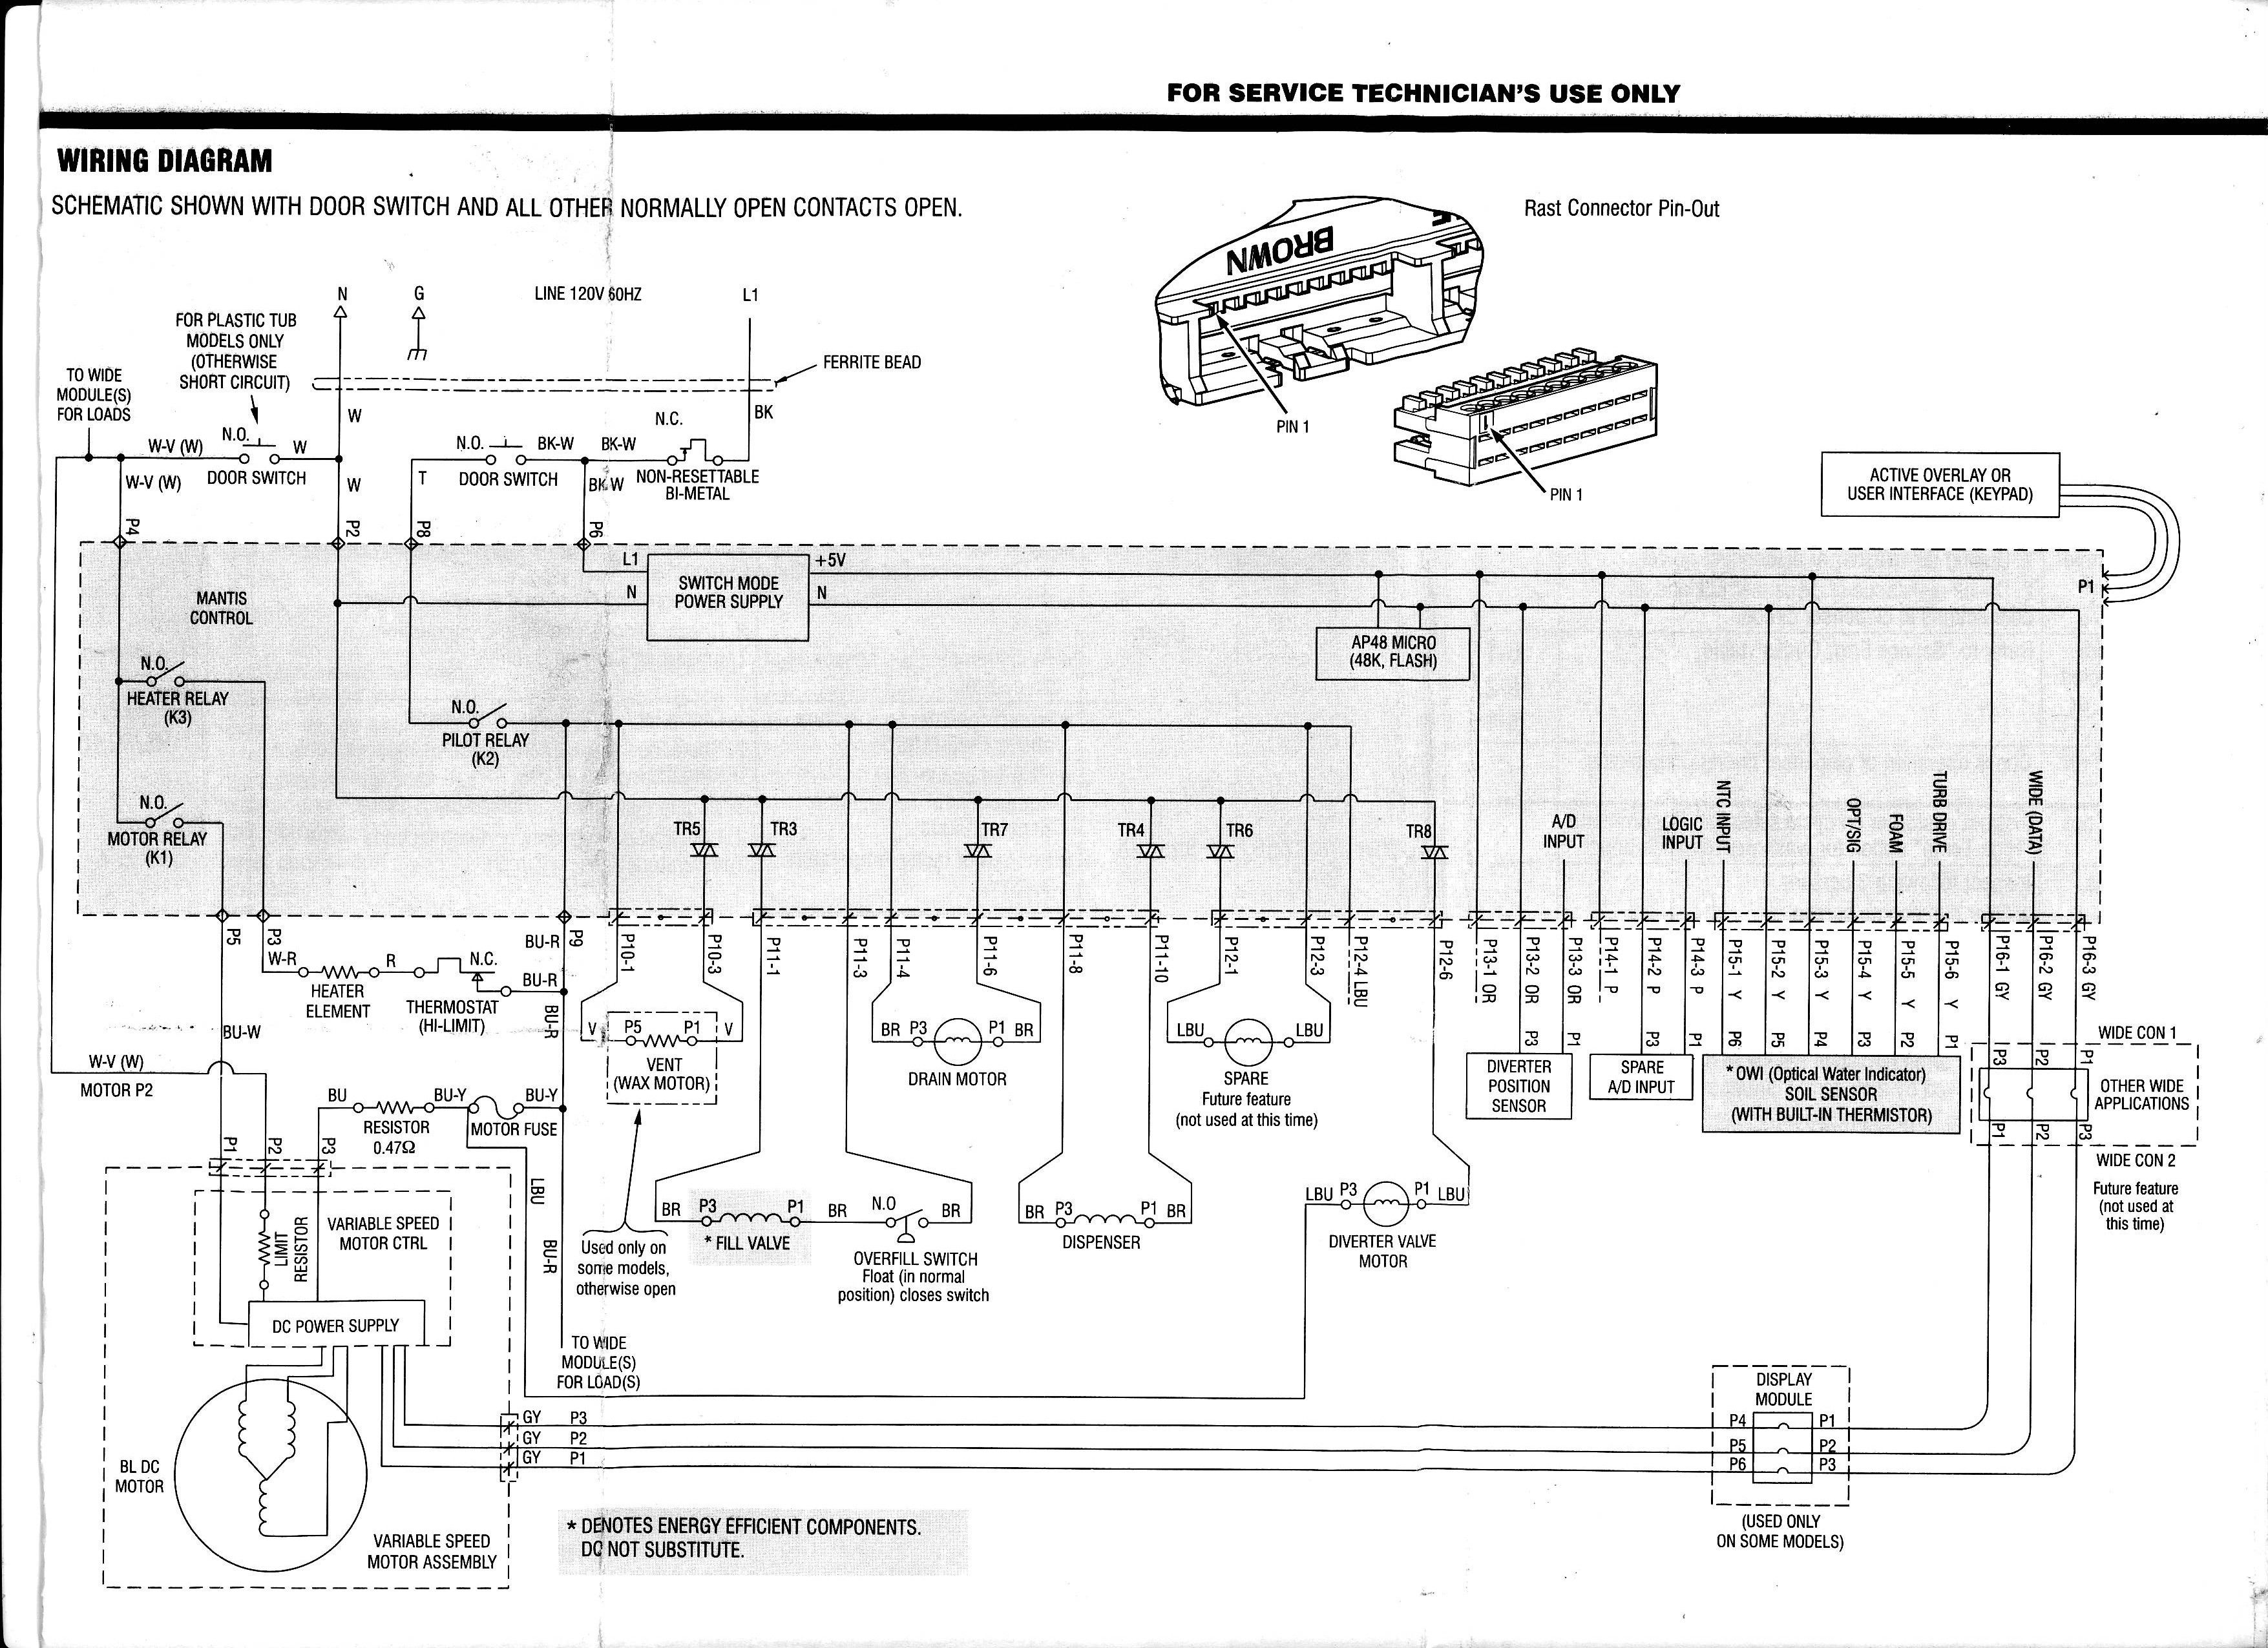 Noministnow: Bosch Nexxt 500 Dryer Parts Diagram